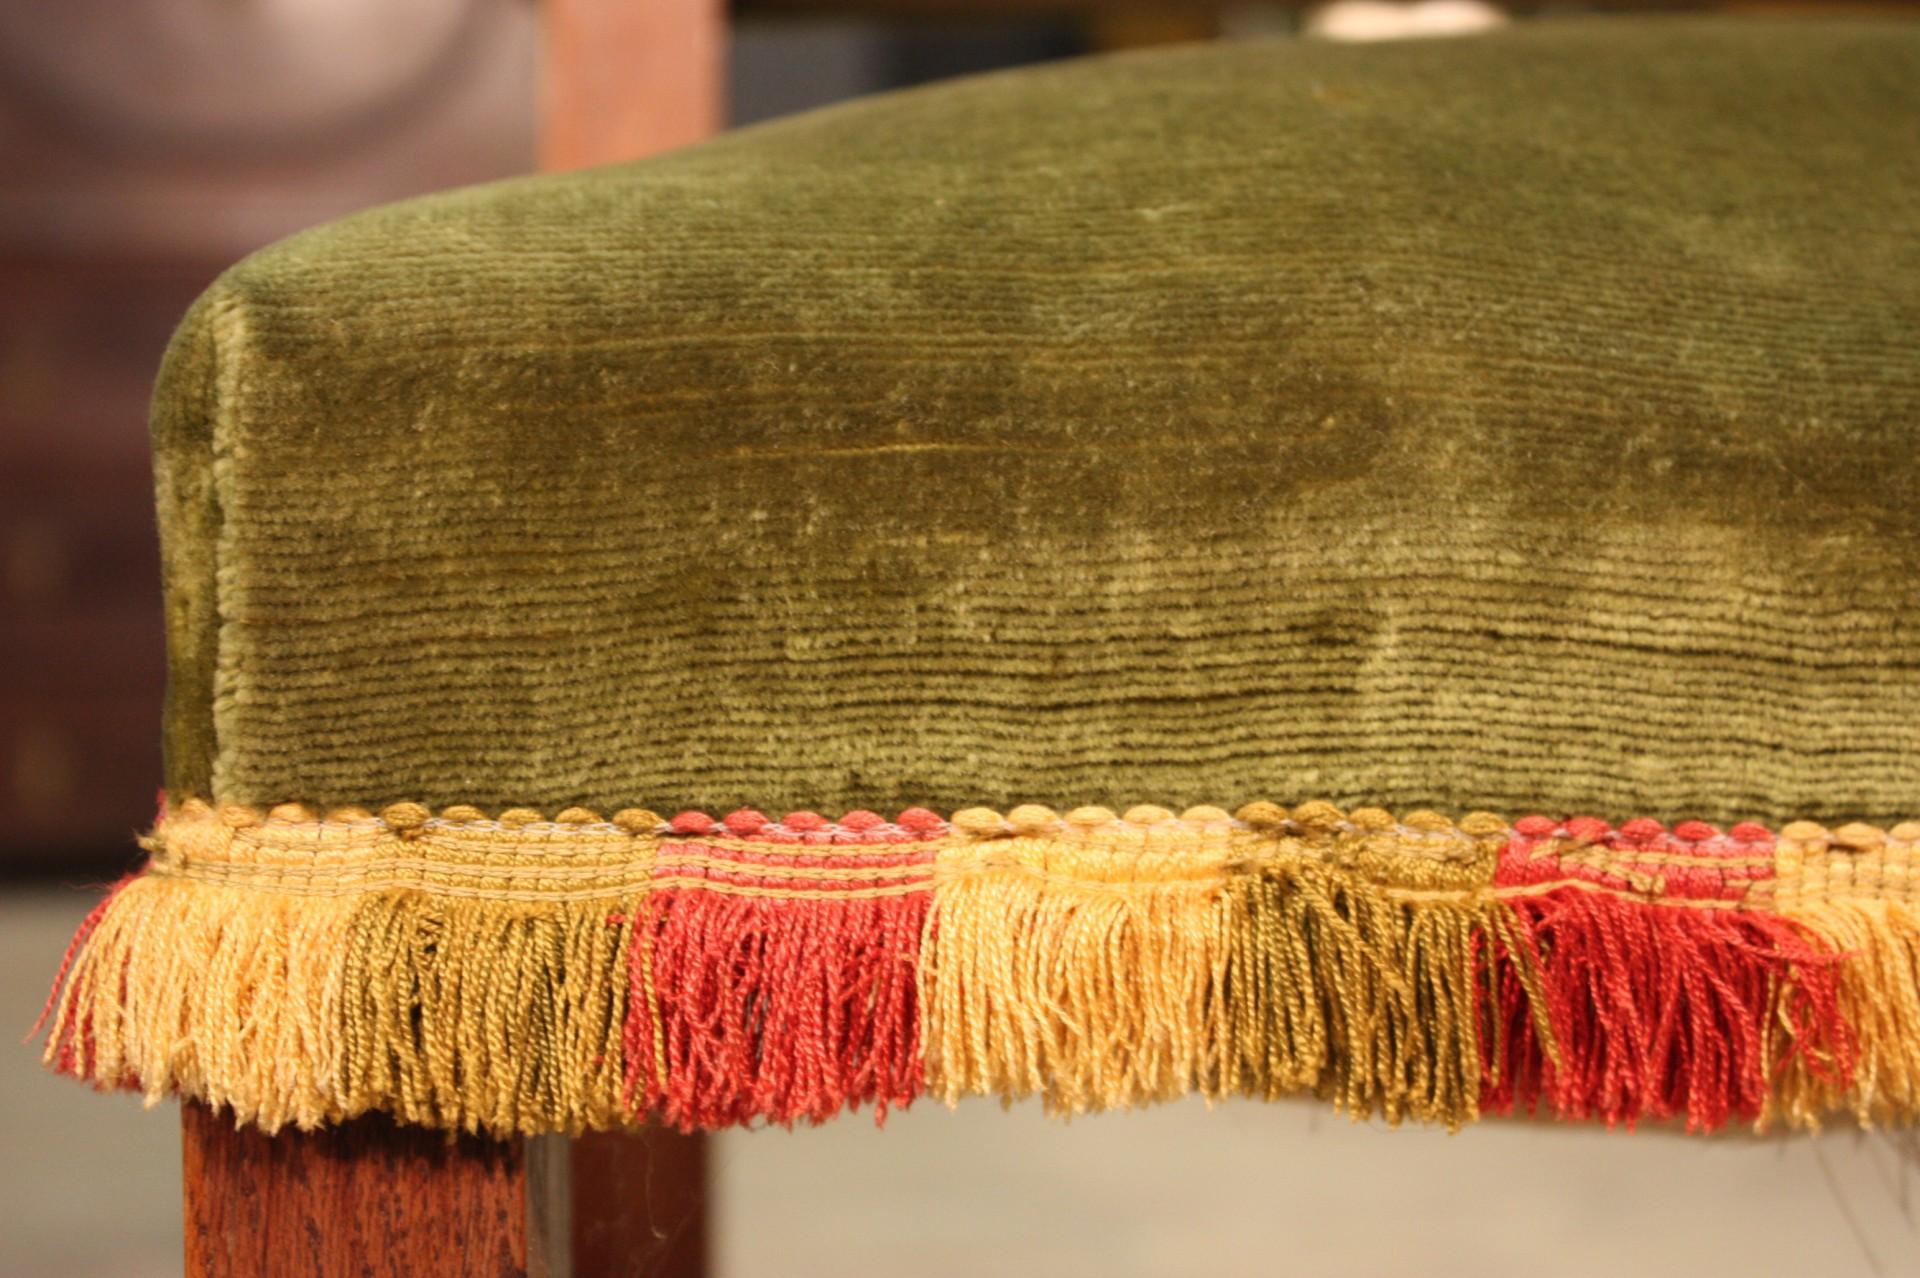 Gruppe 6 stuhl rustikal m bel gemei elt holz eichenholz antik stil 900 antike ebay - Stuhle rustikal ...